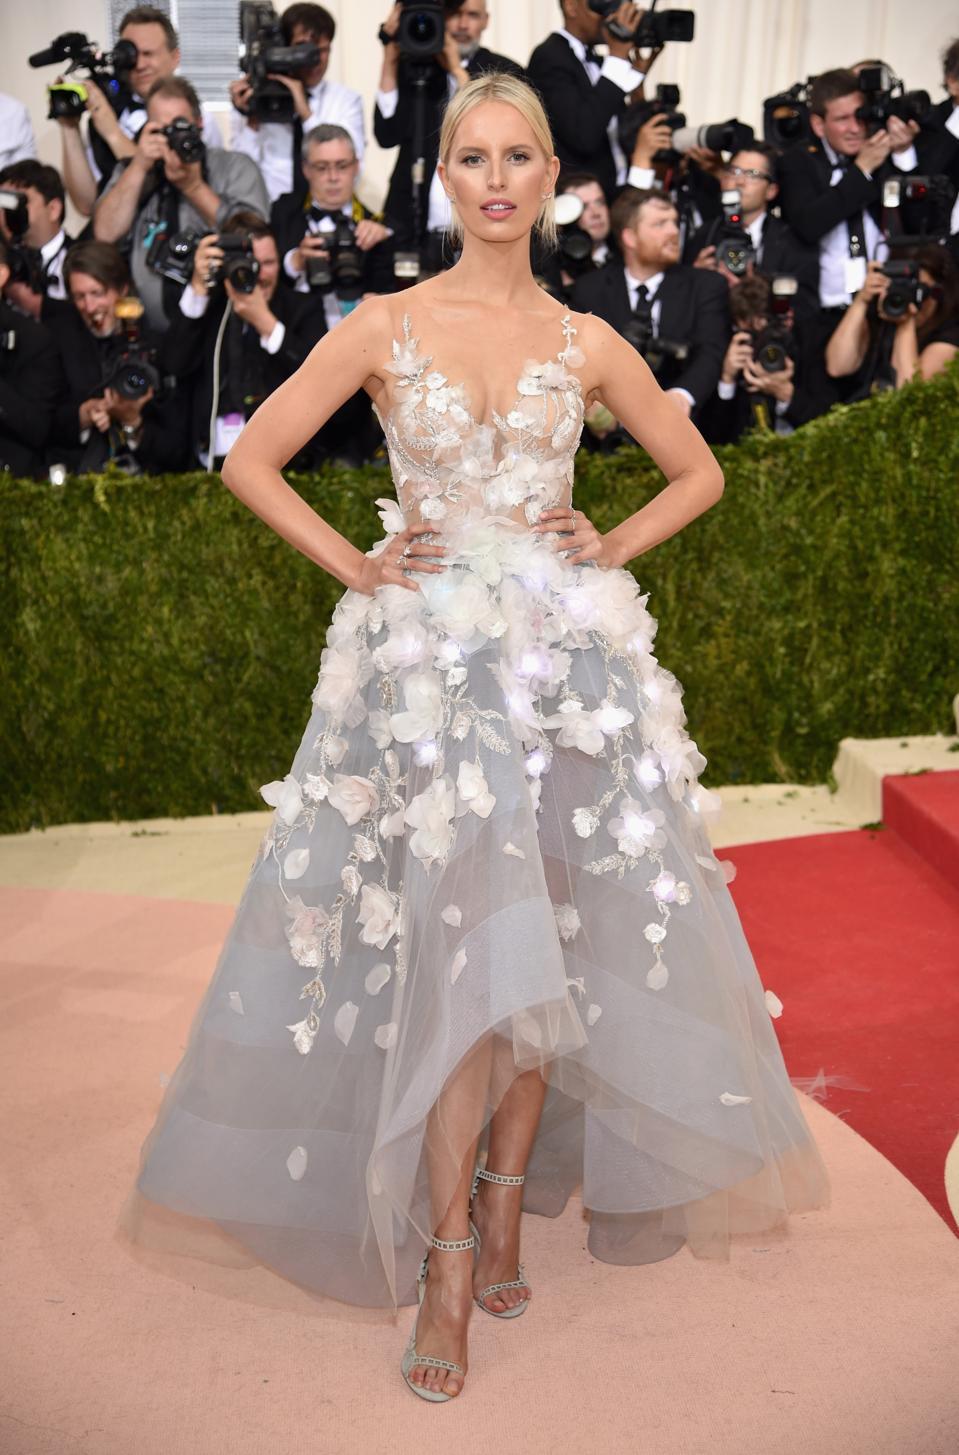 Karolina Kurkova Wears 3D LED Flowers At Met Gala 2016